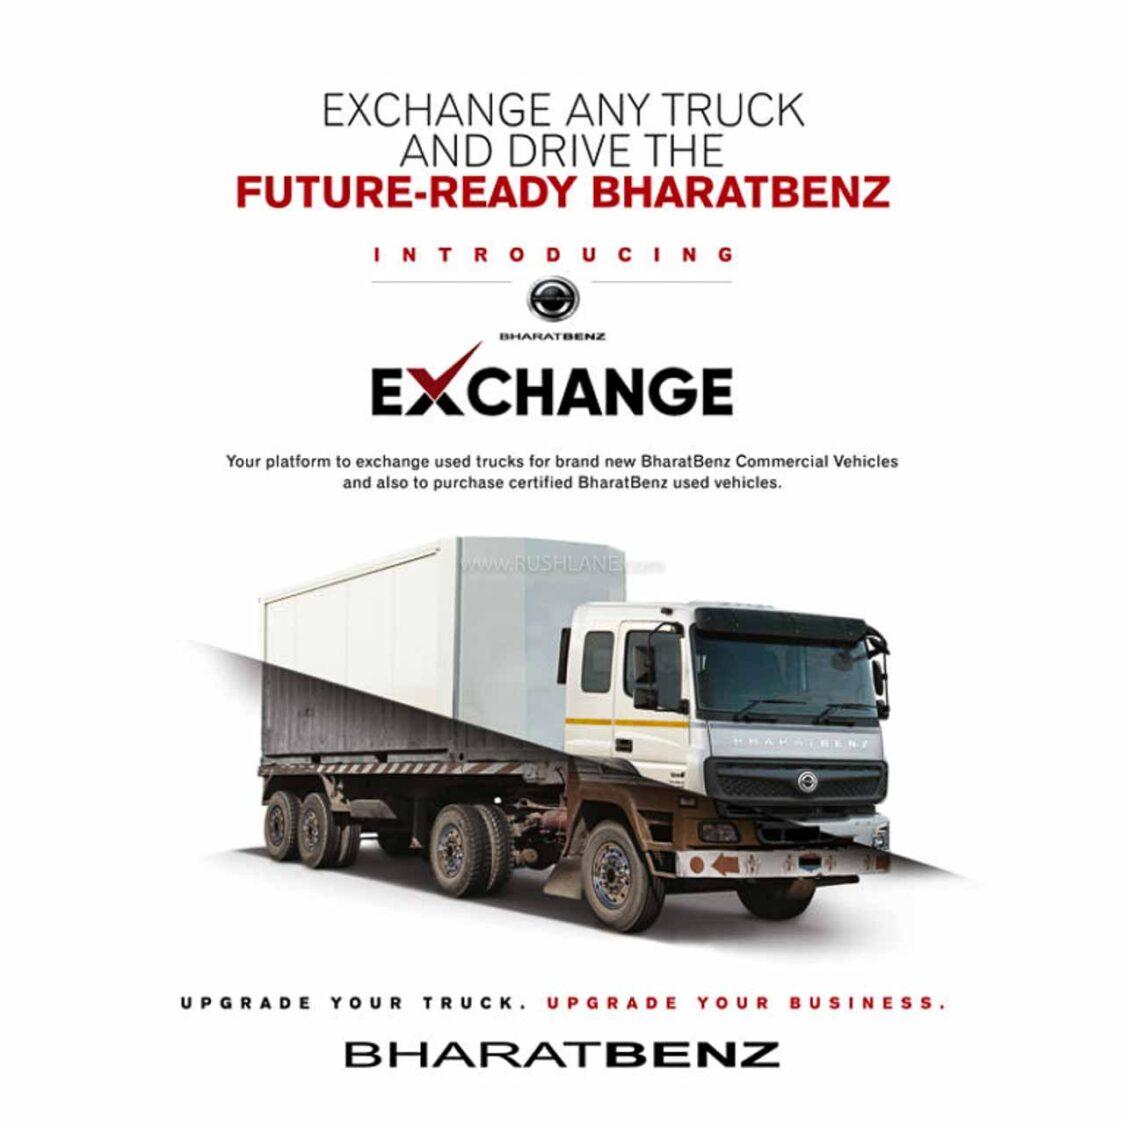 BharatBenz Exchange Program